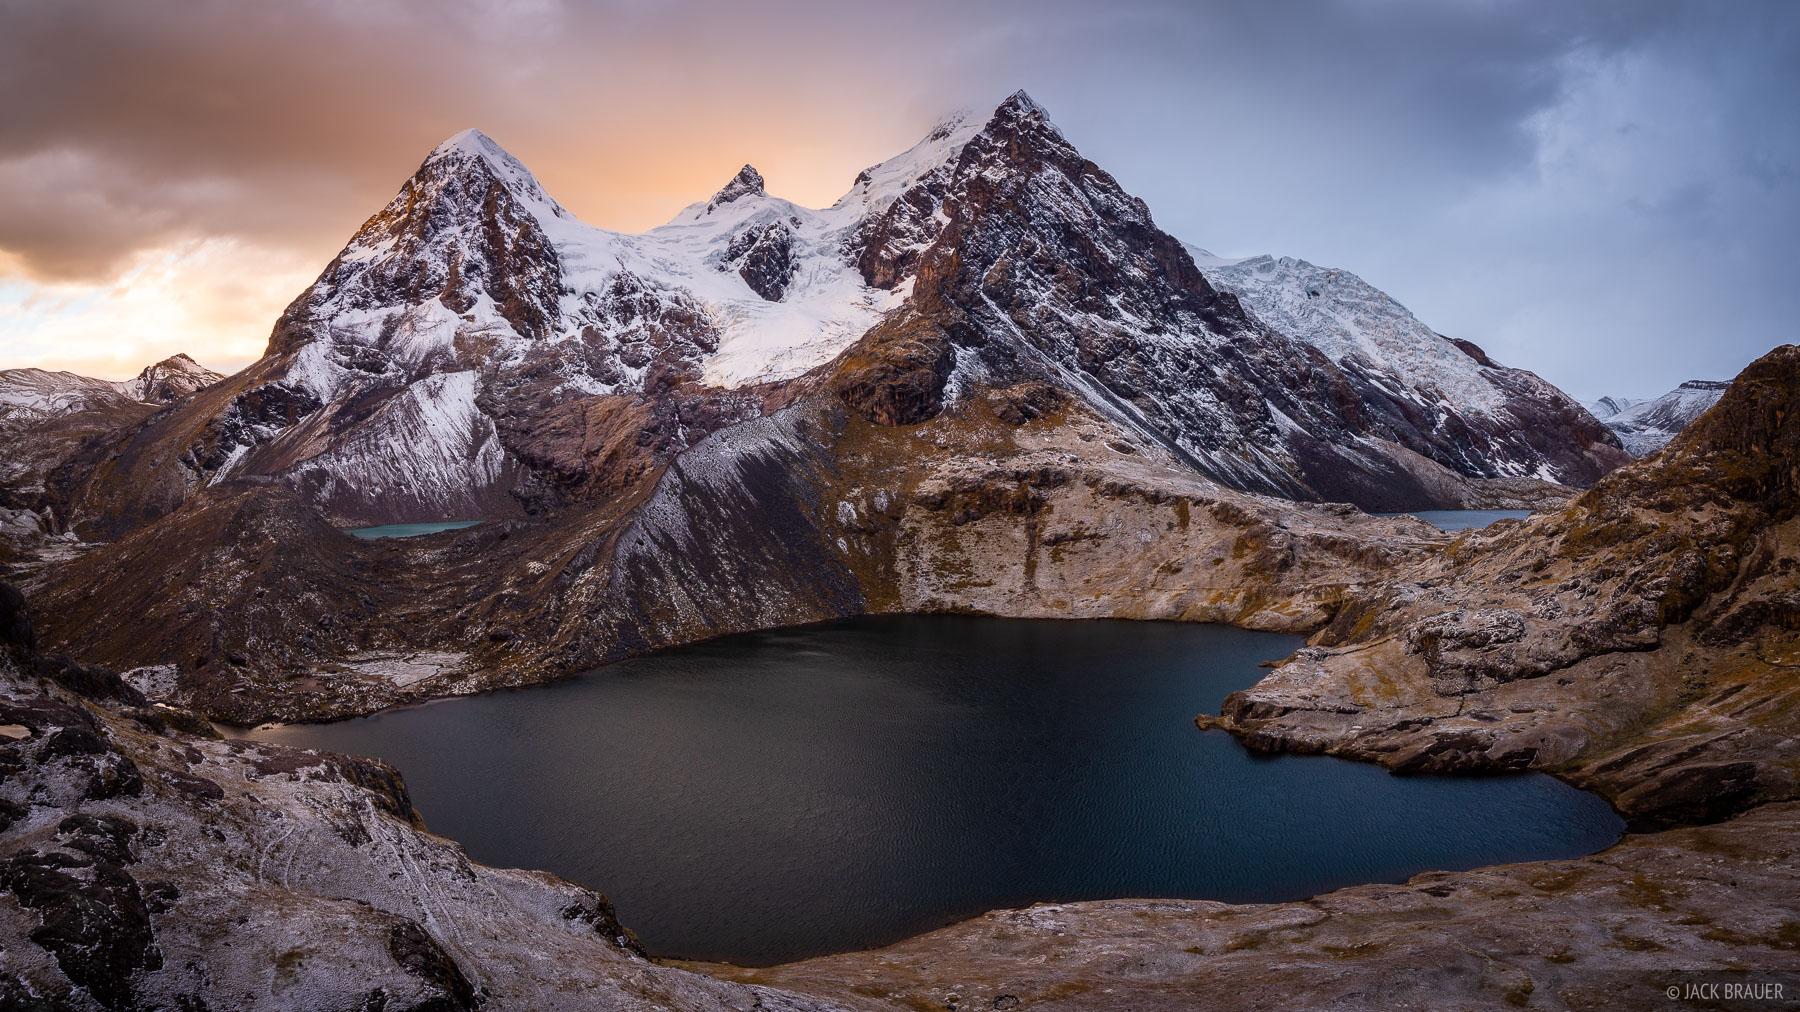 Ausangate, Cordillera Vilcanota, Lago Uchuy Pucacocha, Peru, South America, photo